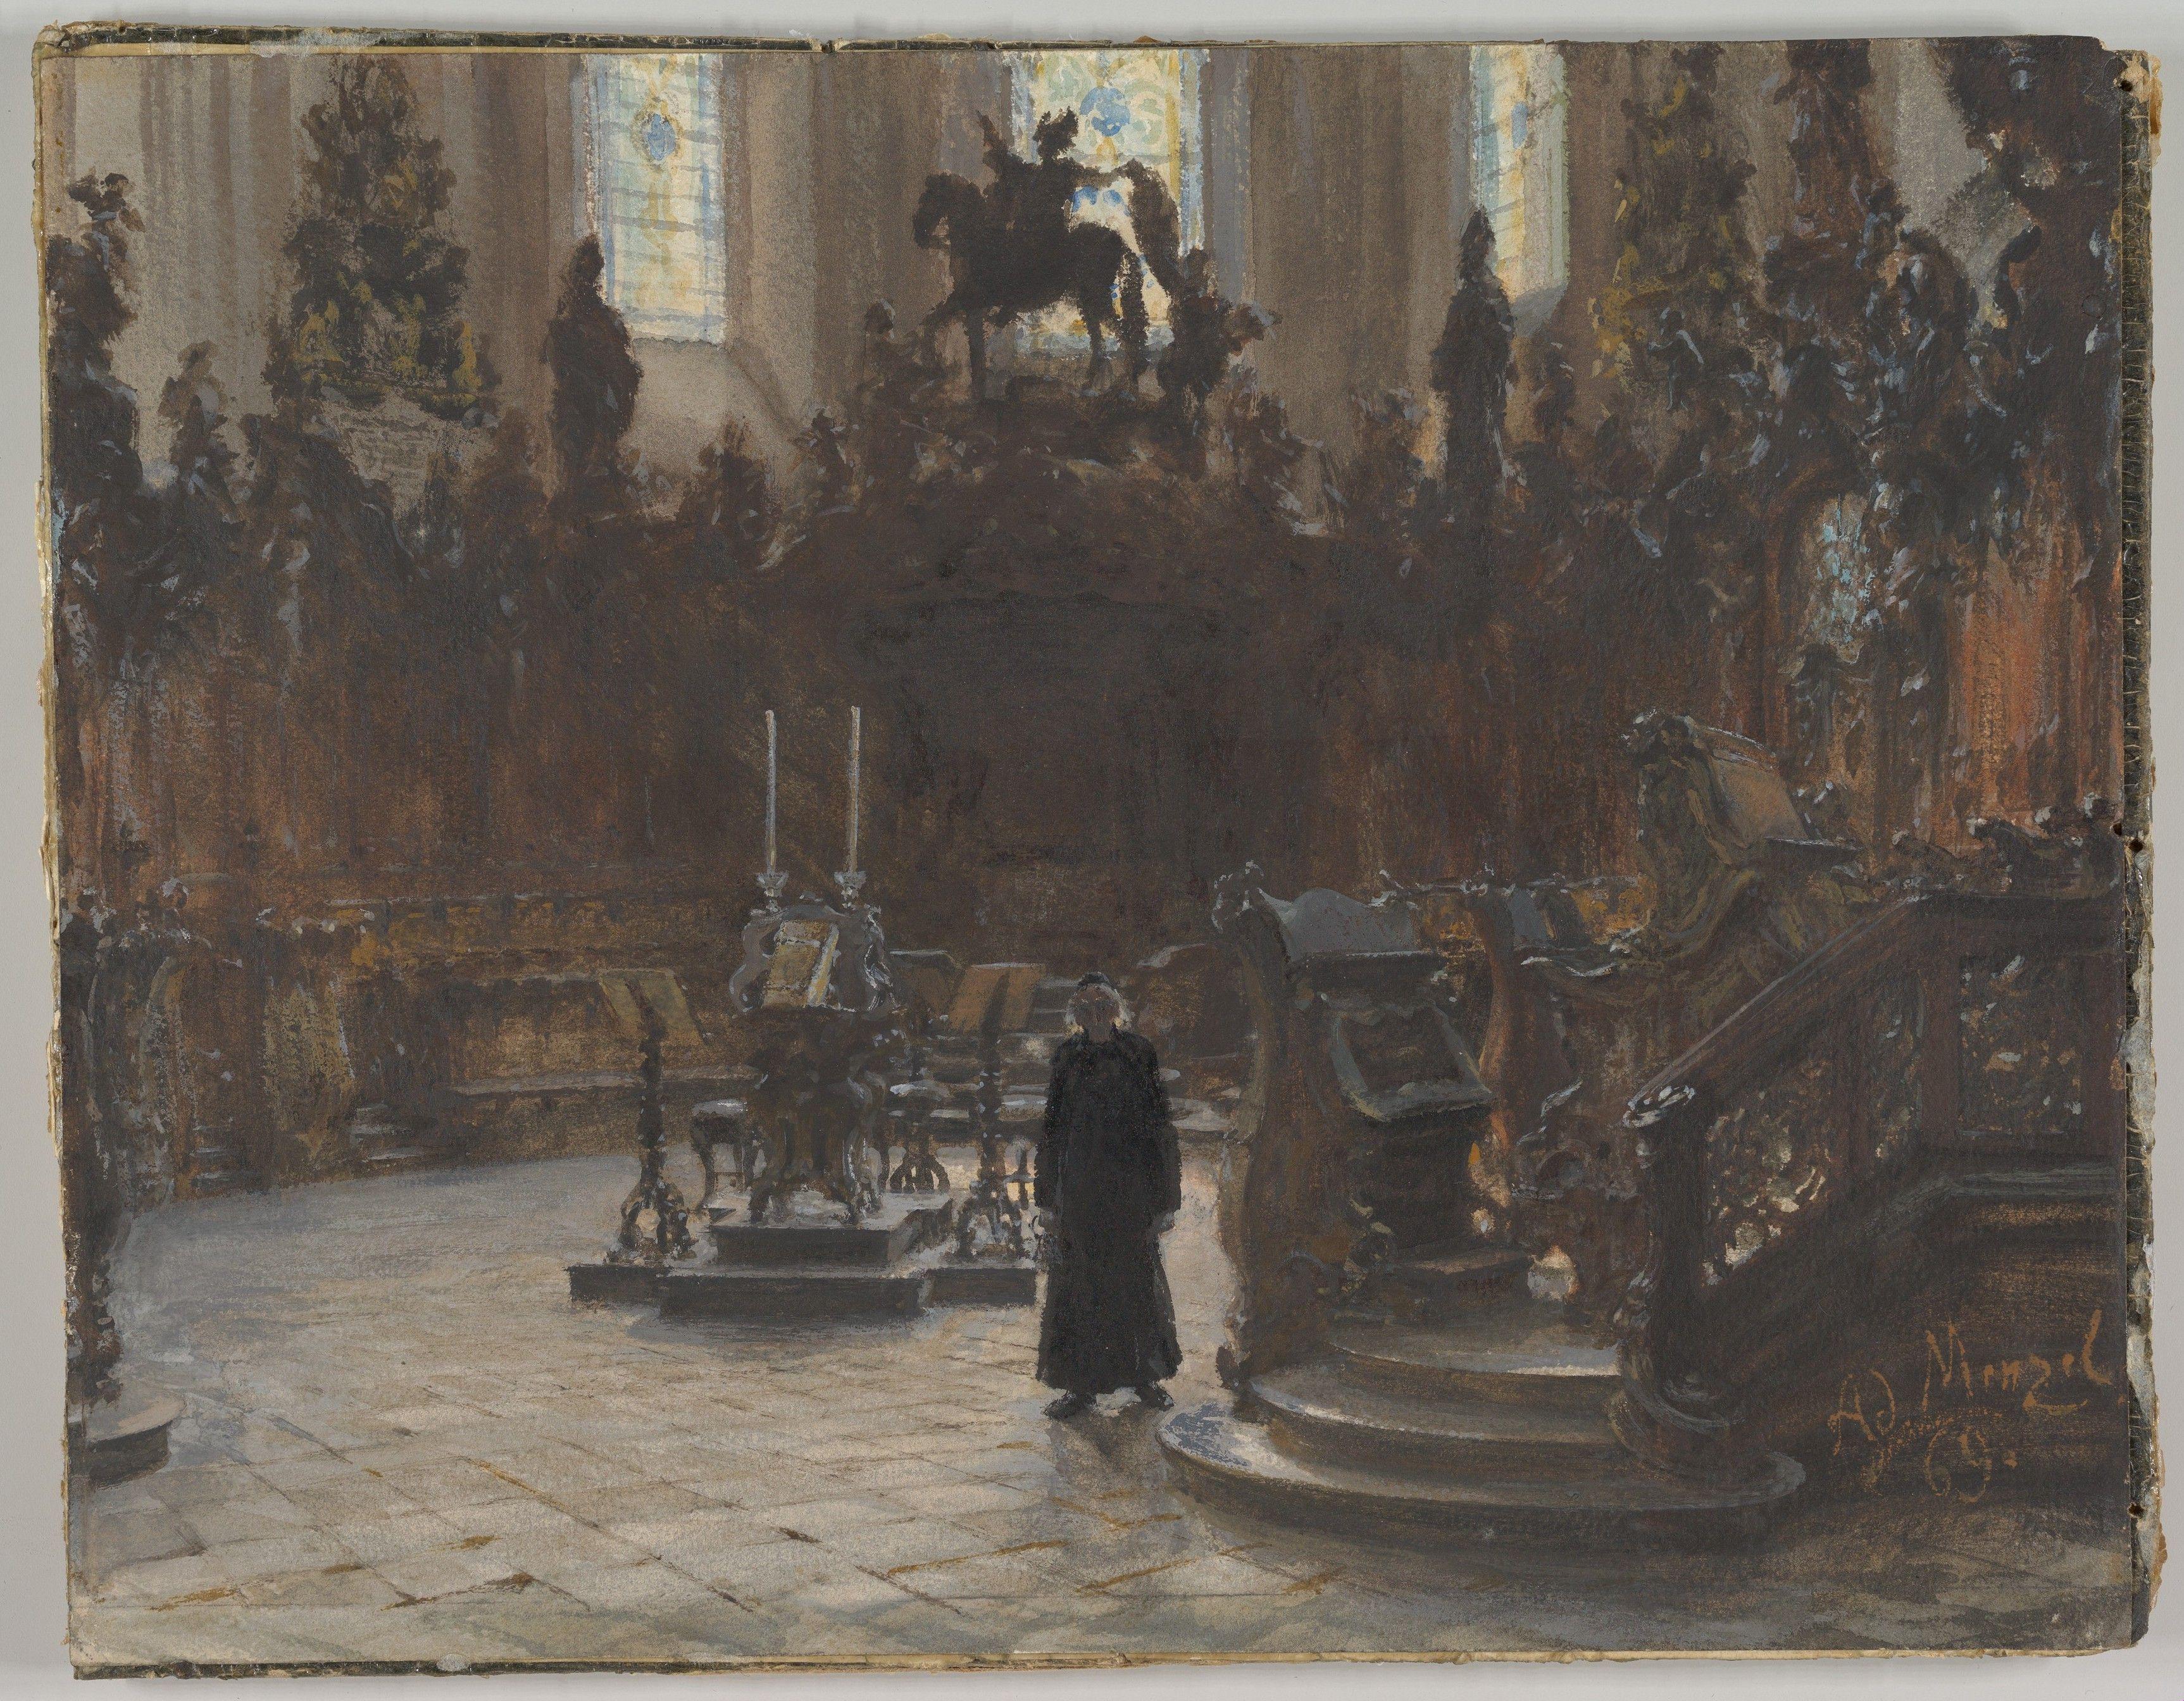 Adolph Menzel The Choirstalls In The Mainz Cathedral 1869 In 2020 Literature Art Art Sculpture Art